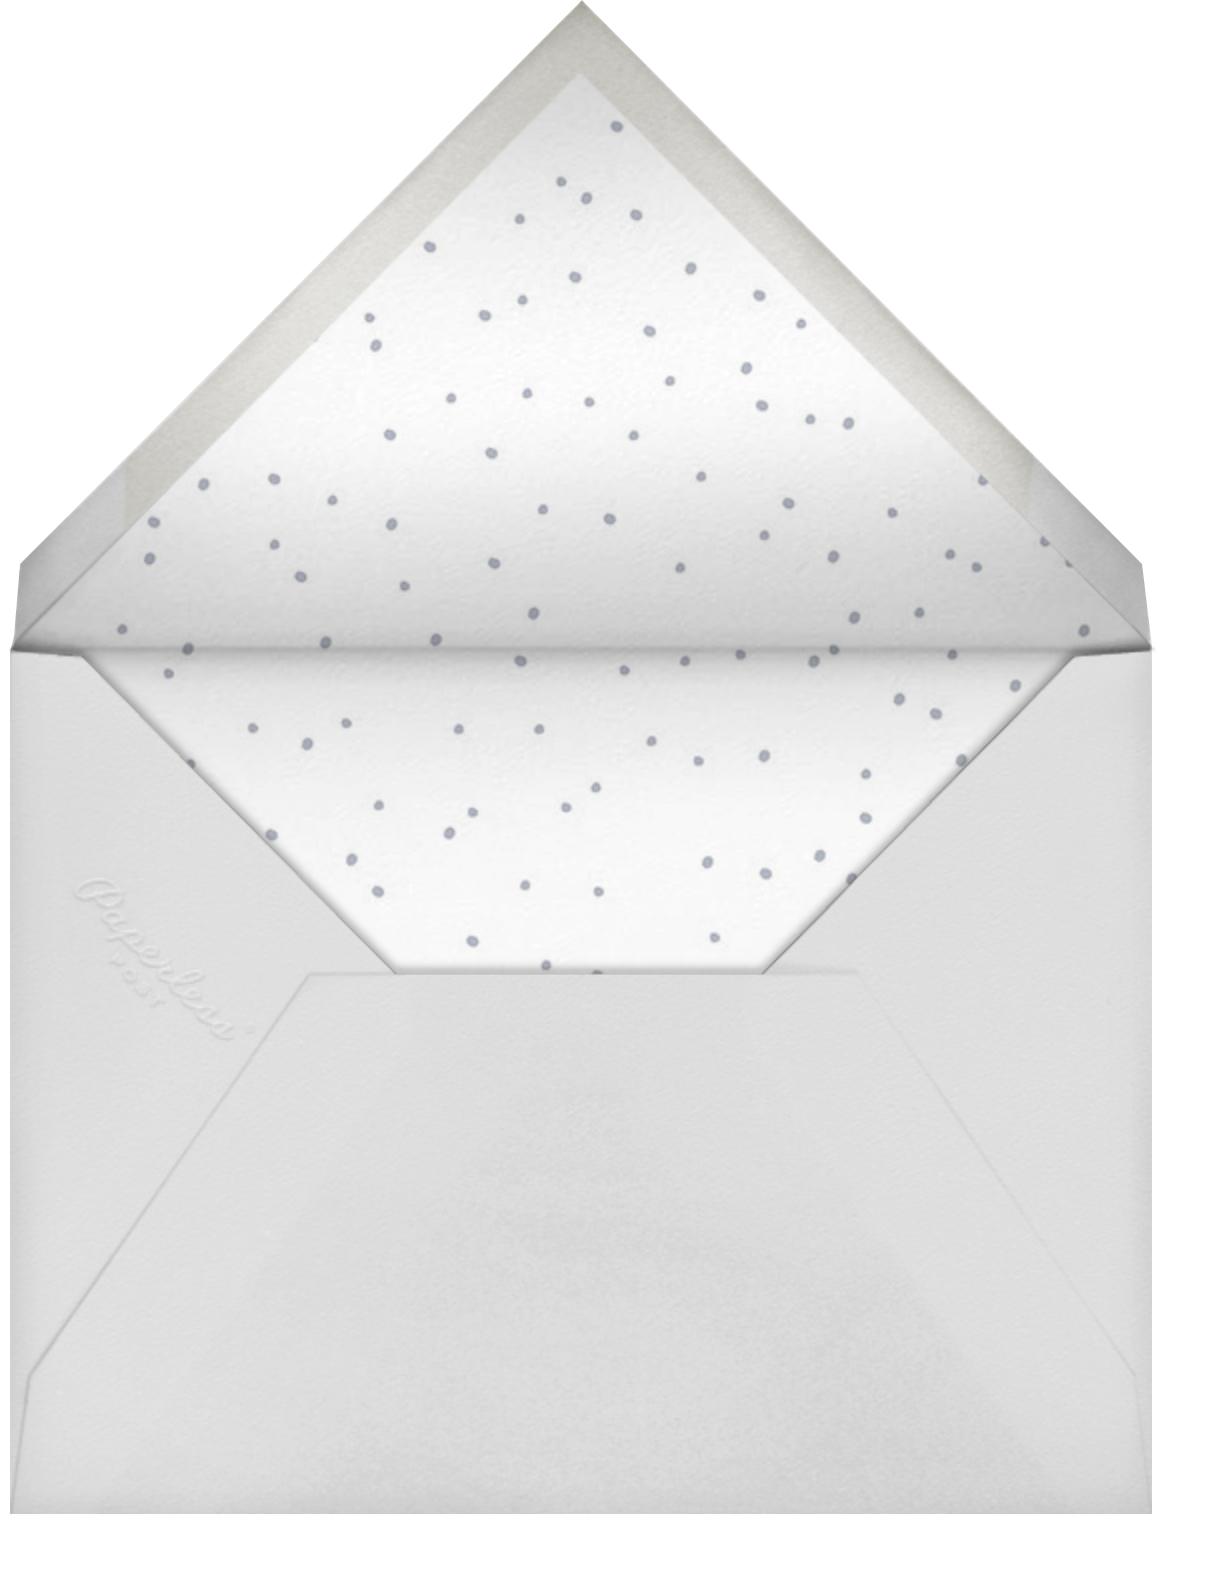 Hanukkah in Tiny Town - Little Cube - Hanukkah - envelope back